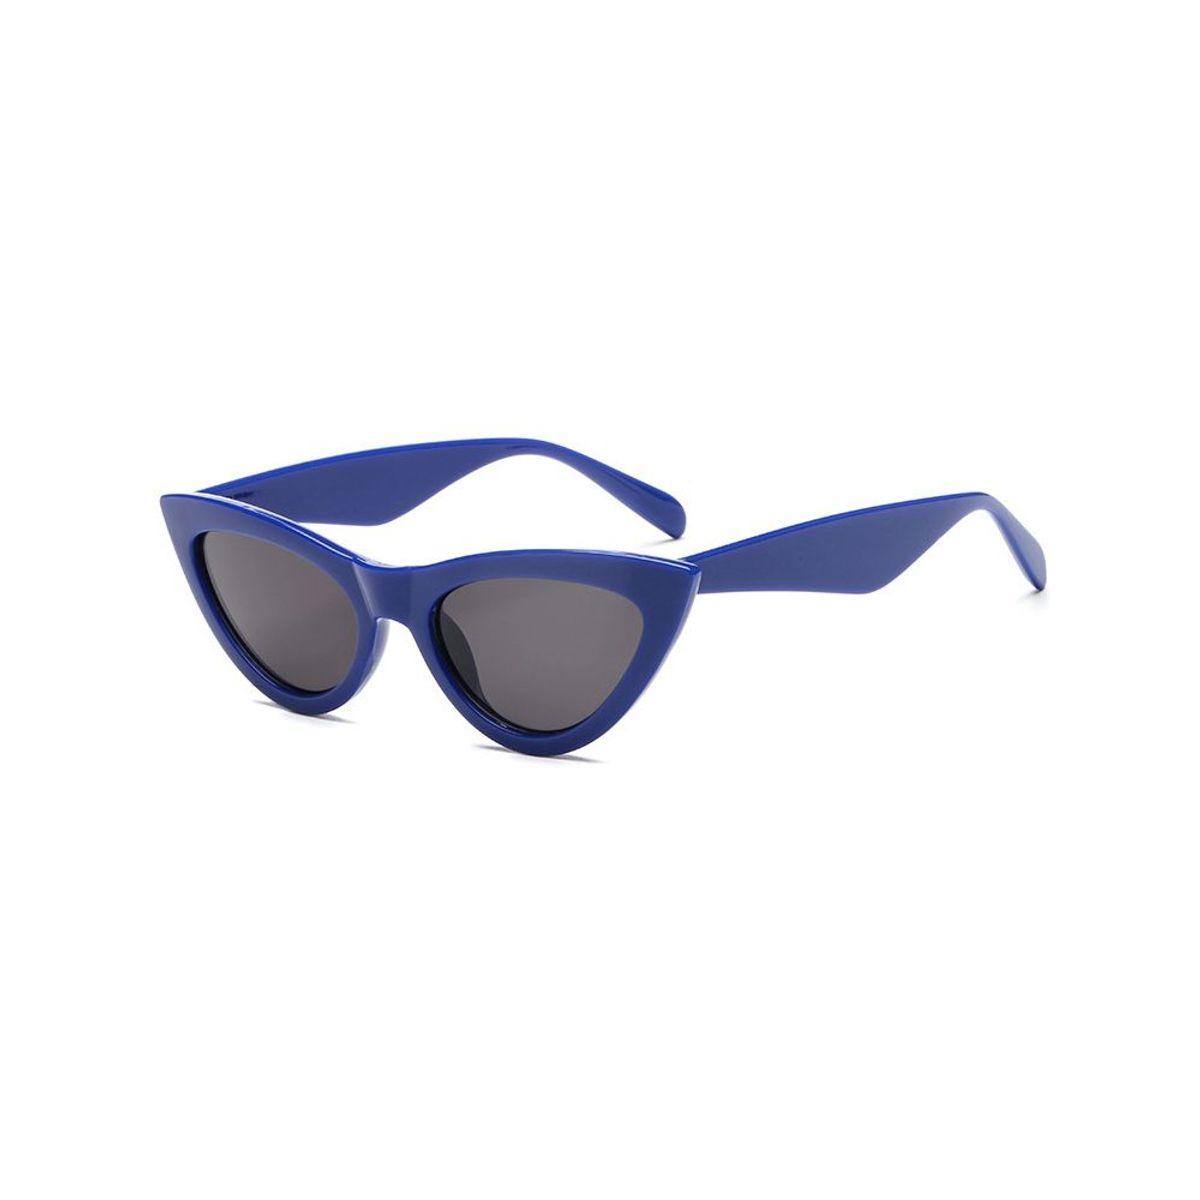 1635146dc Óculos de Sol Lara / Gatinho Cat Eye Olho de Gato Retrô Vintage Azul | Óculos  Feminino Nunca Usado 32664005 | enjoei